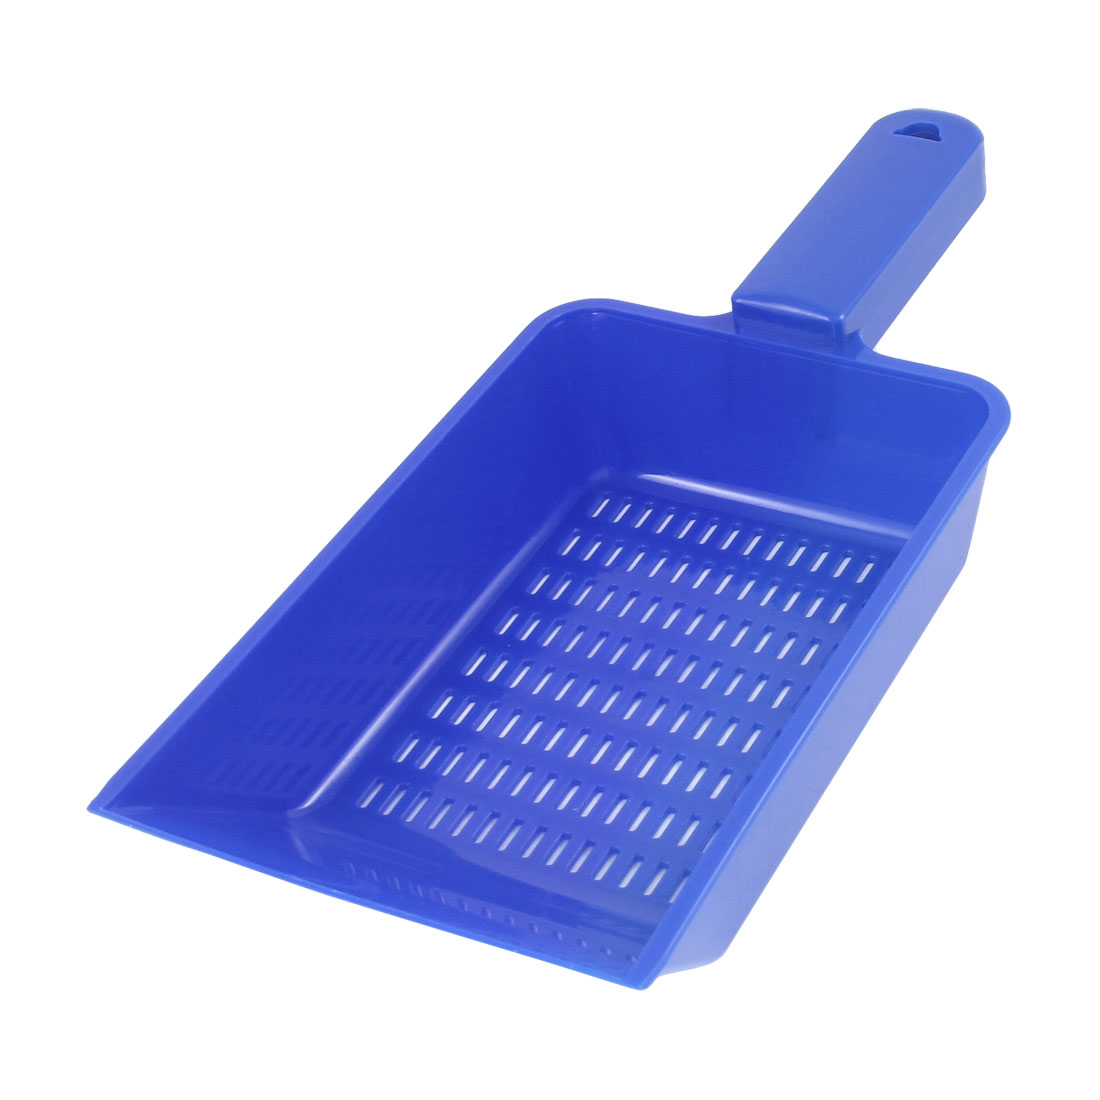 Aquarium Fish Tank Plastic Multihole Shovel Sand Scraper Scoop Pan Blue